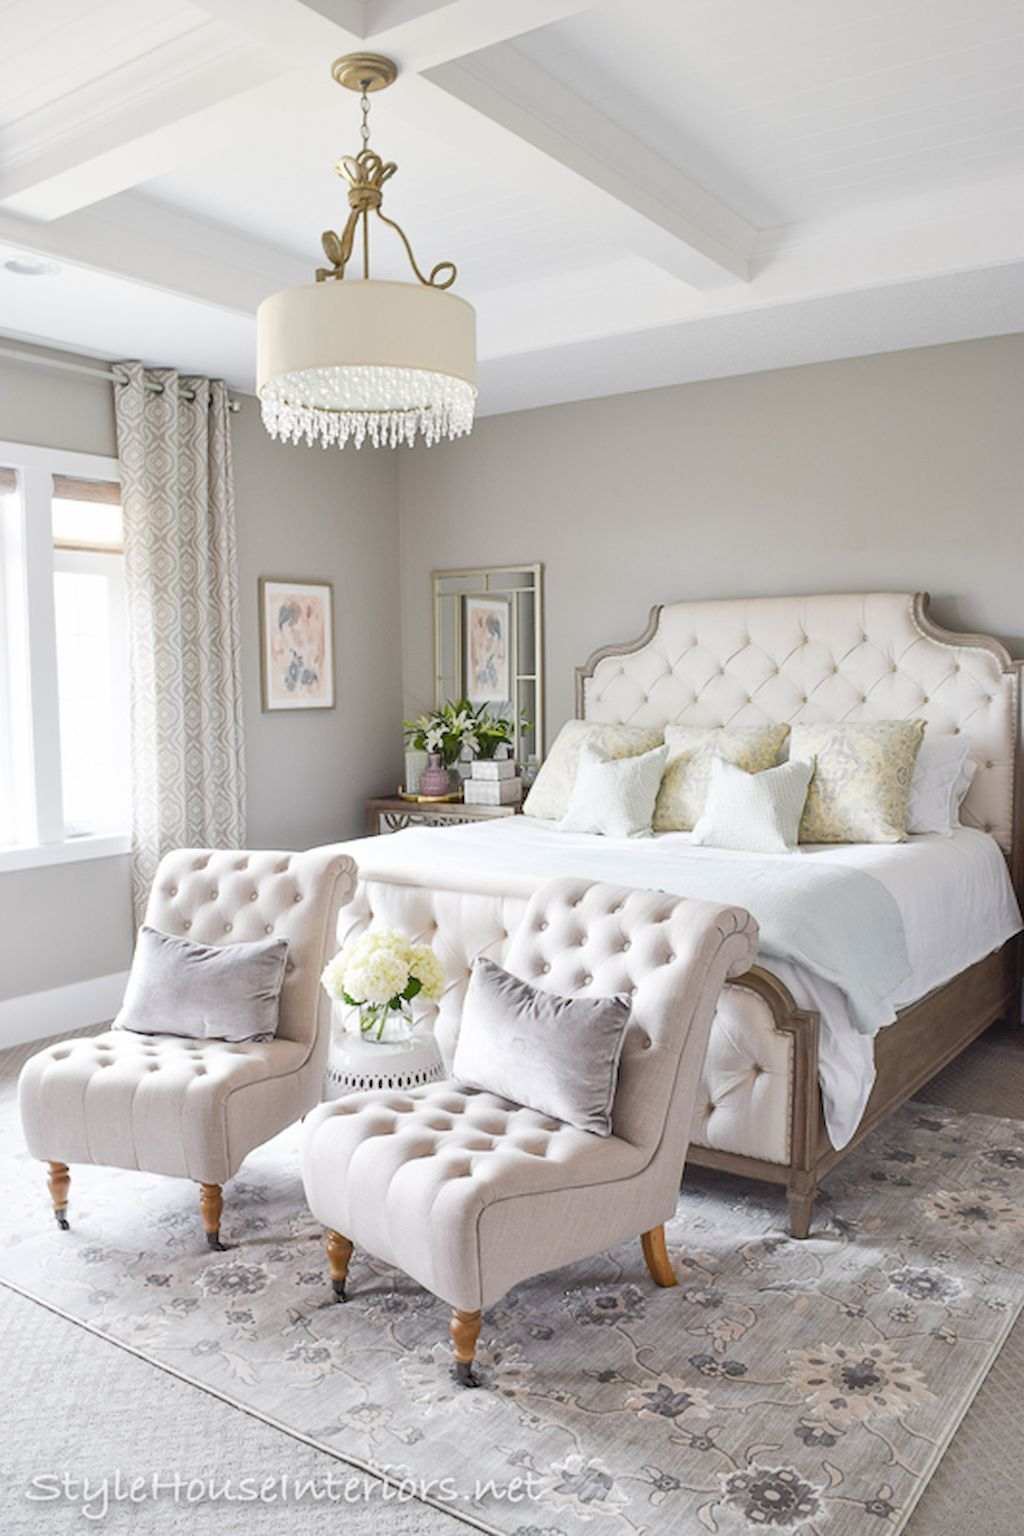 nice 60 beautiful master bedroom decorating ideas httpshomevialandcom2017